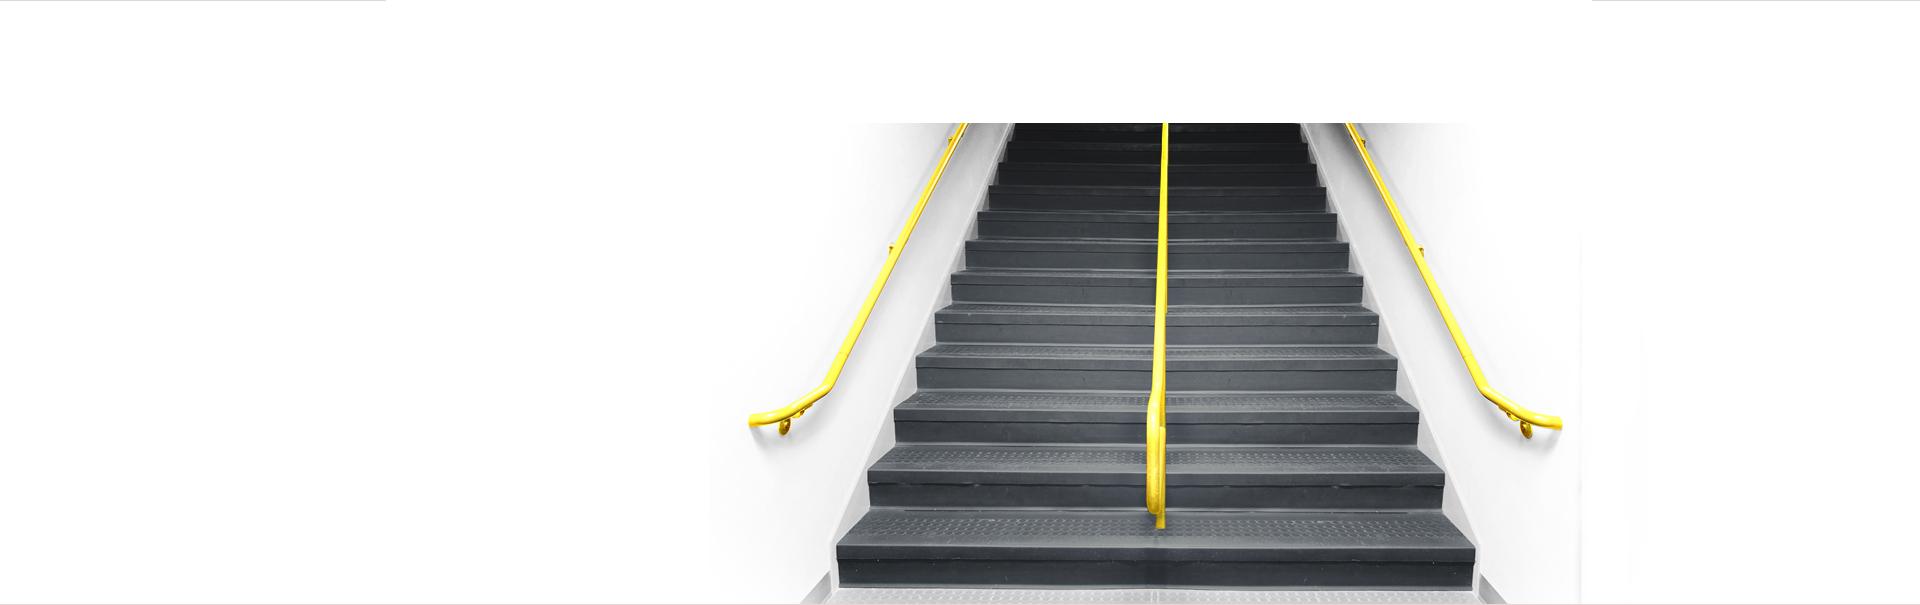 Egress Stair